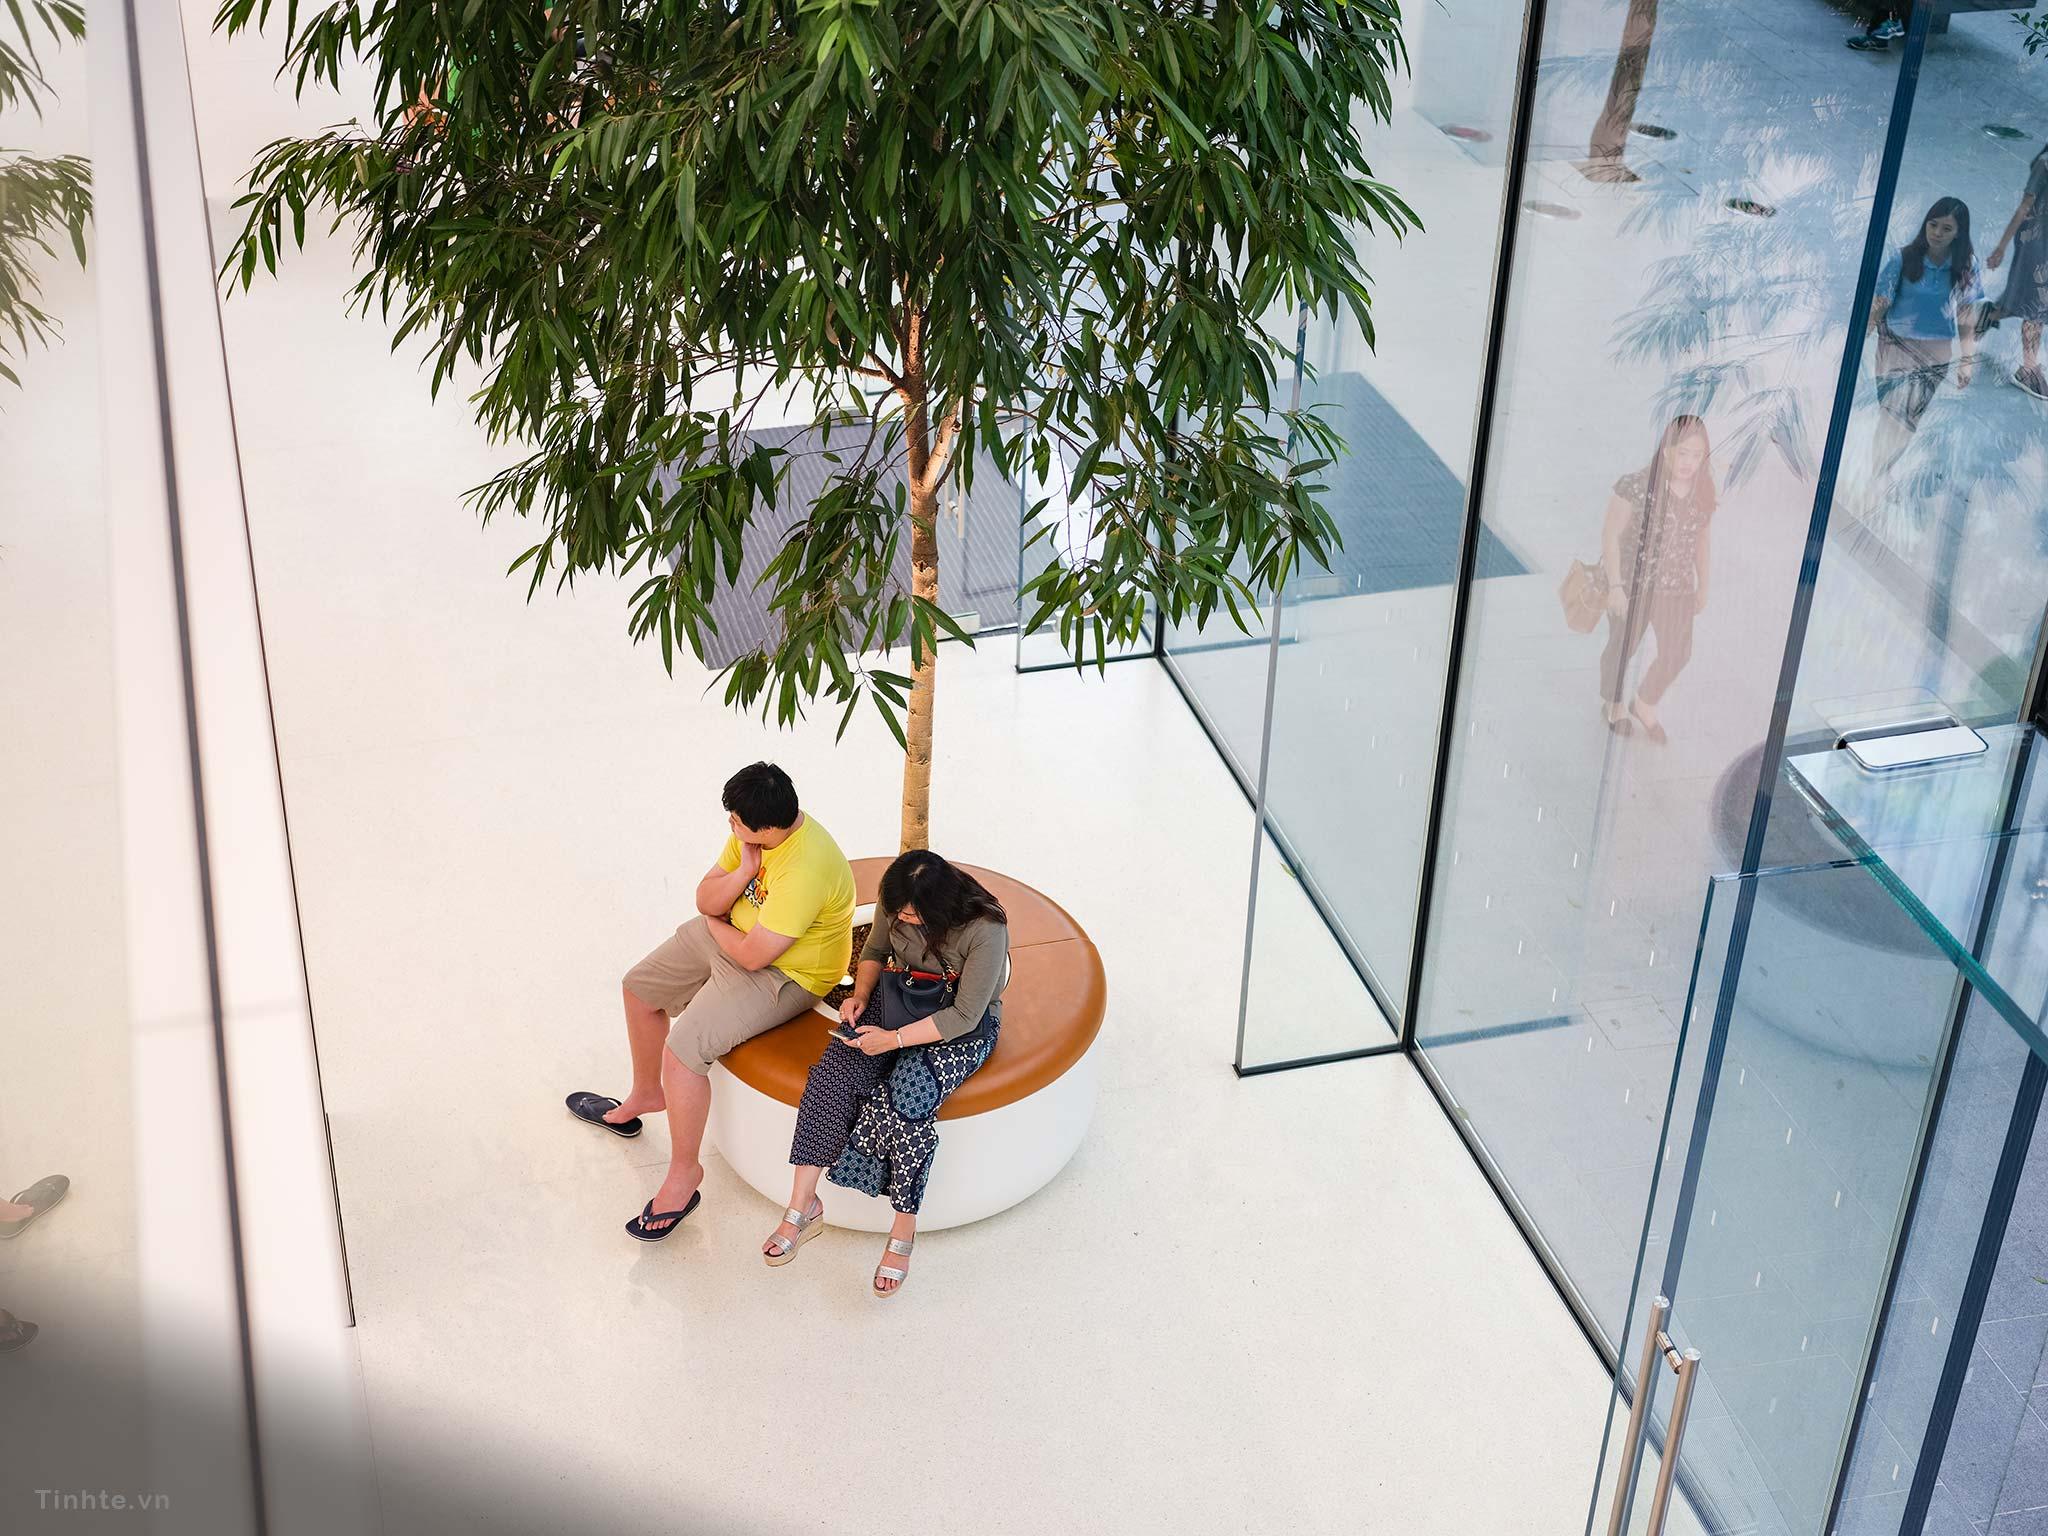 Apple-Store-Singapore-12.jpg